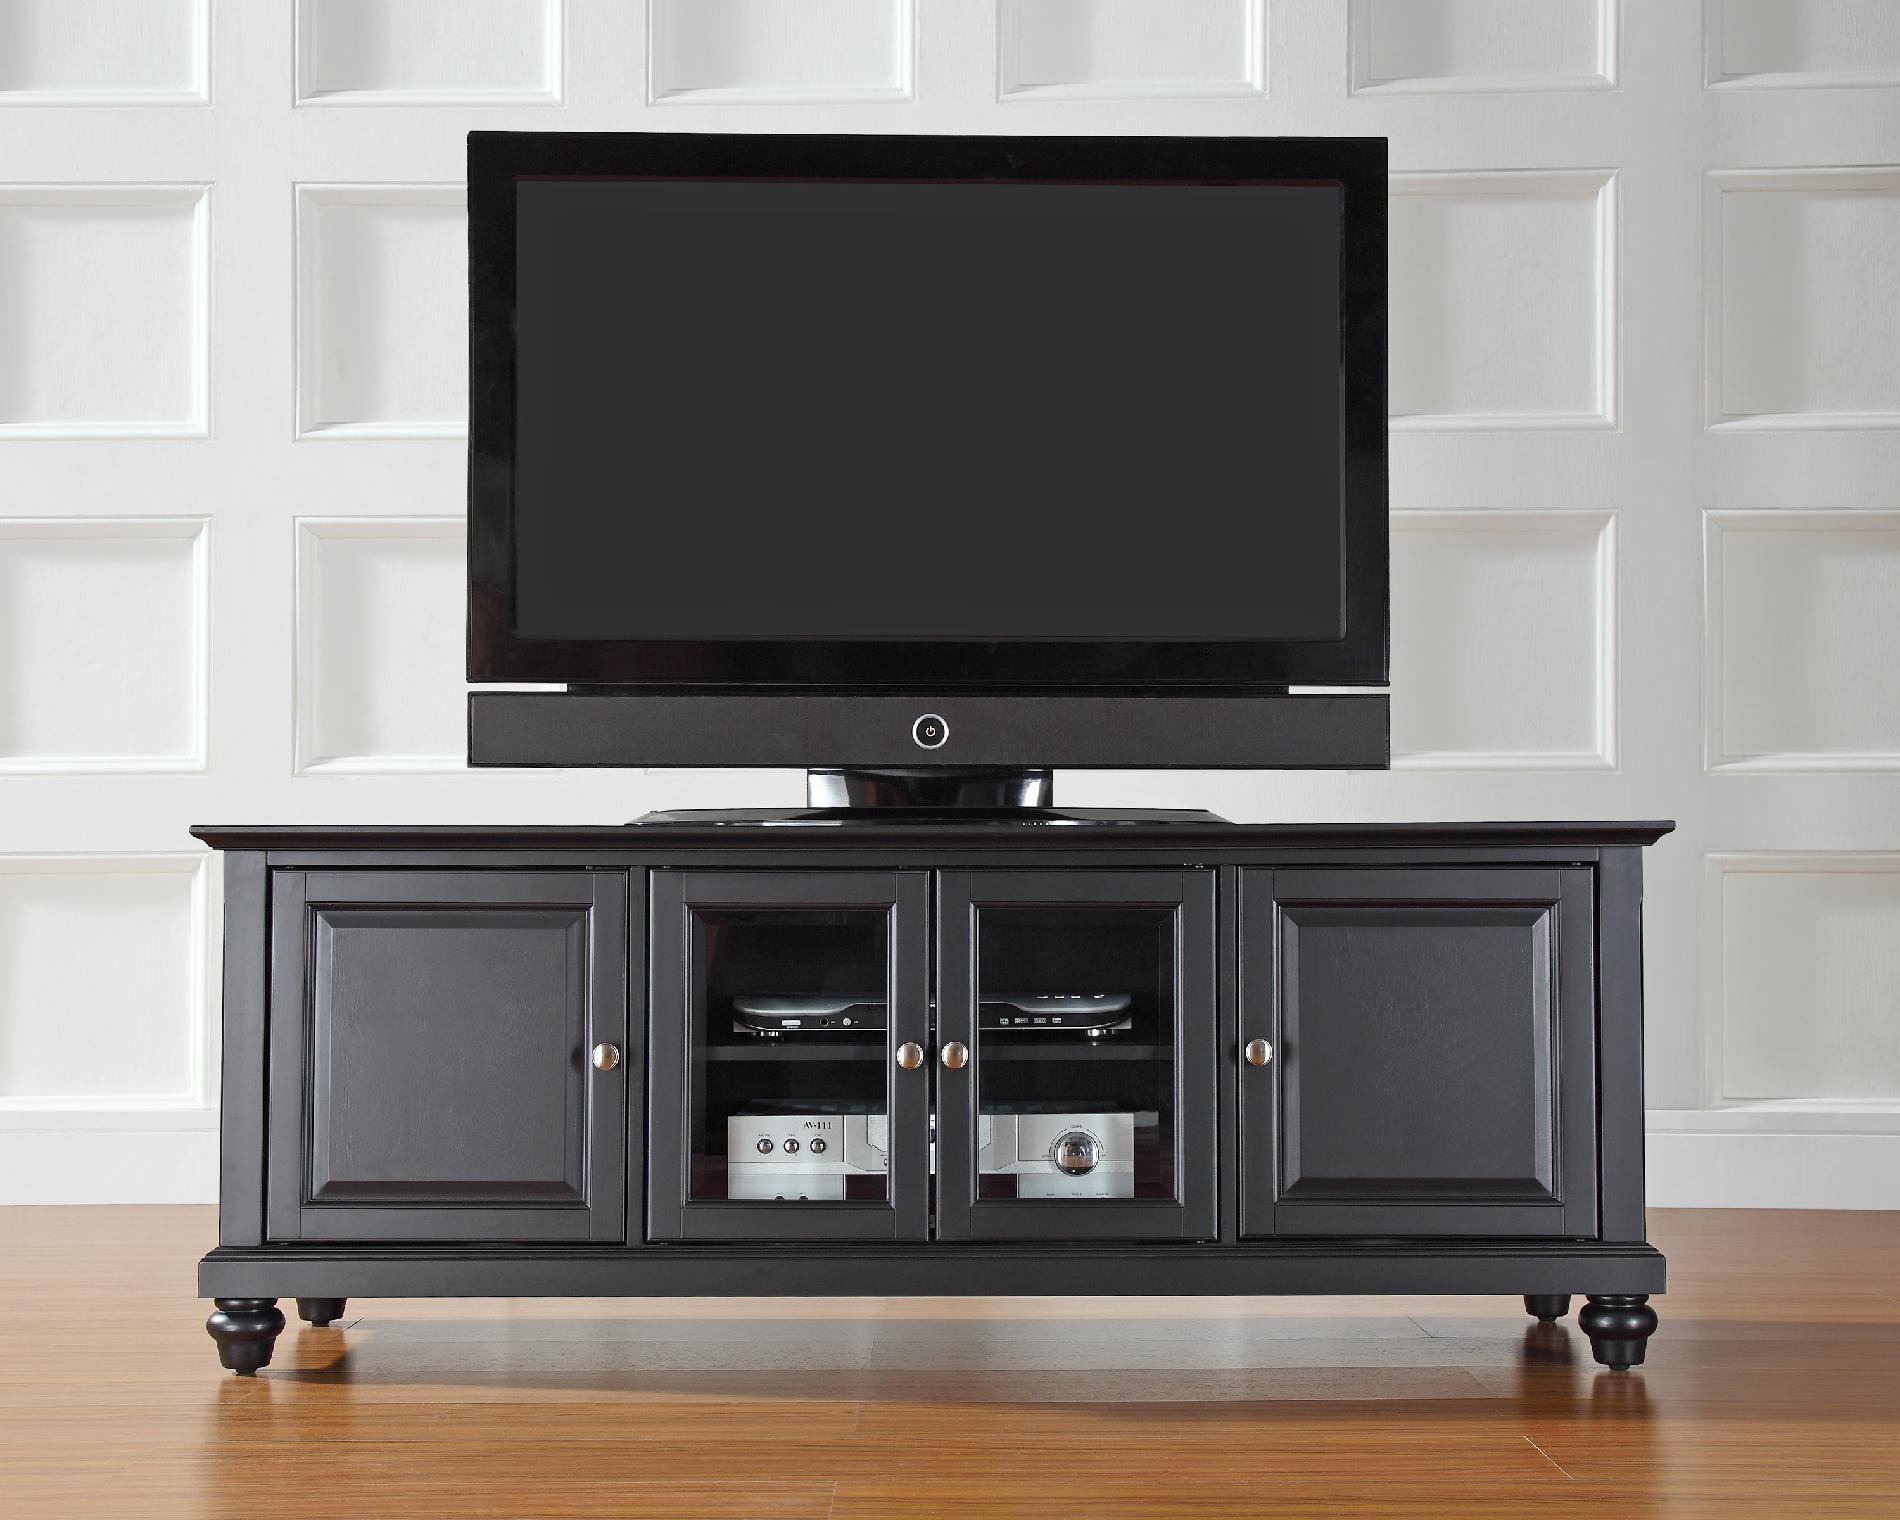 Crosley Furniture Cambridge 60in Low Profile TV Stand in Black